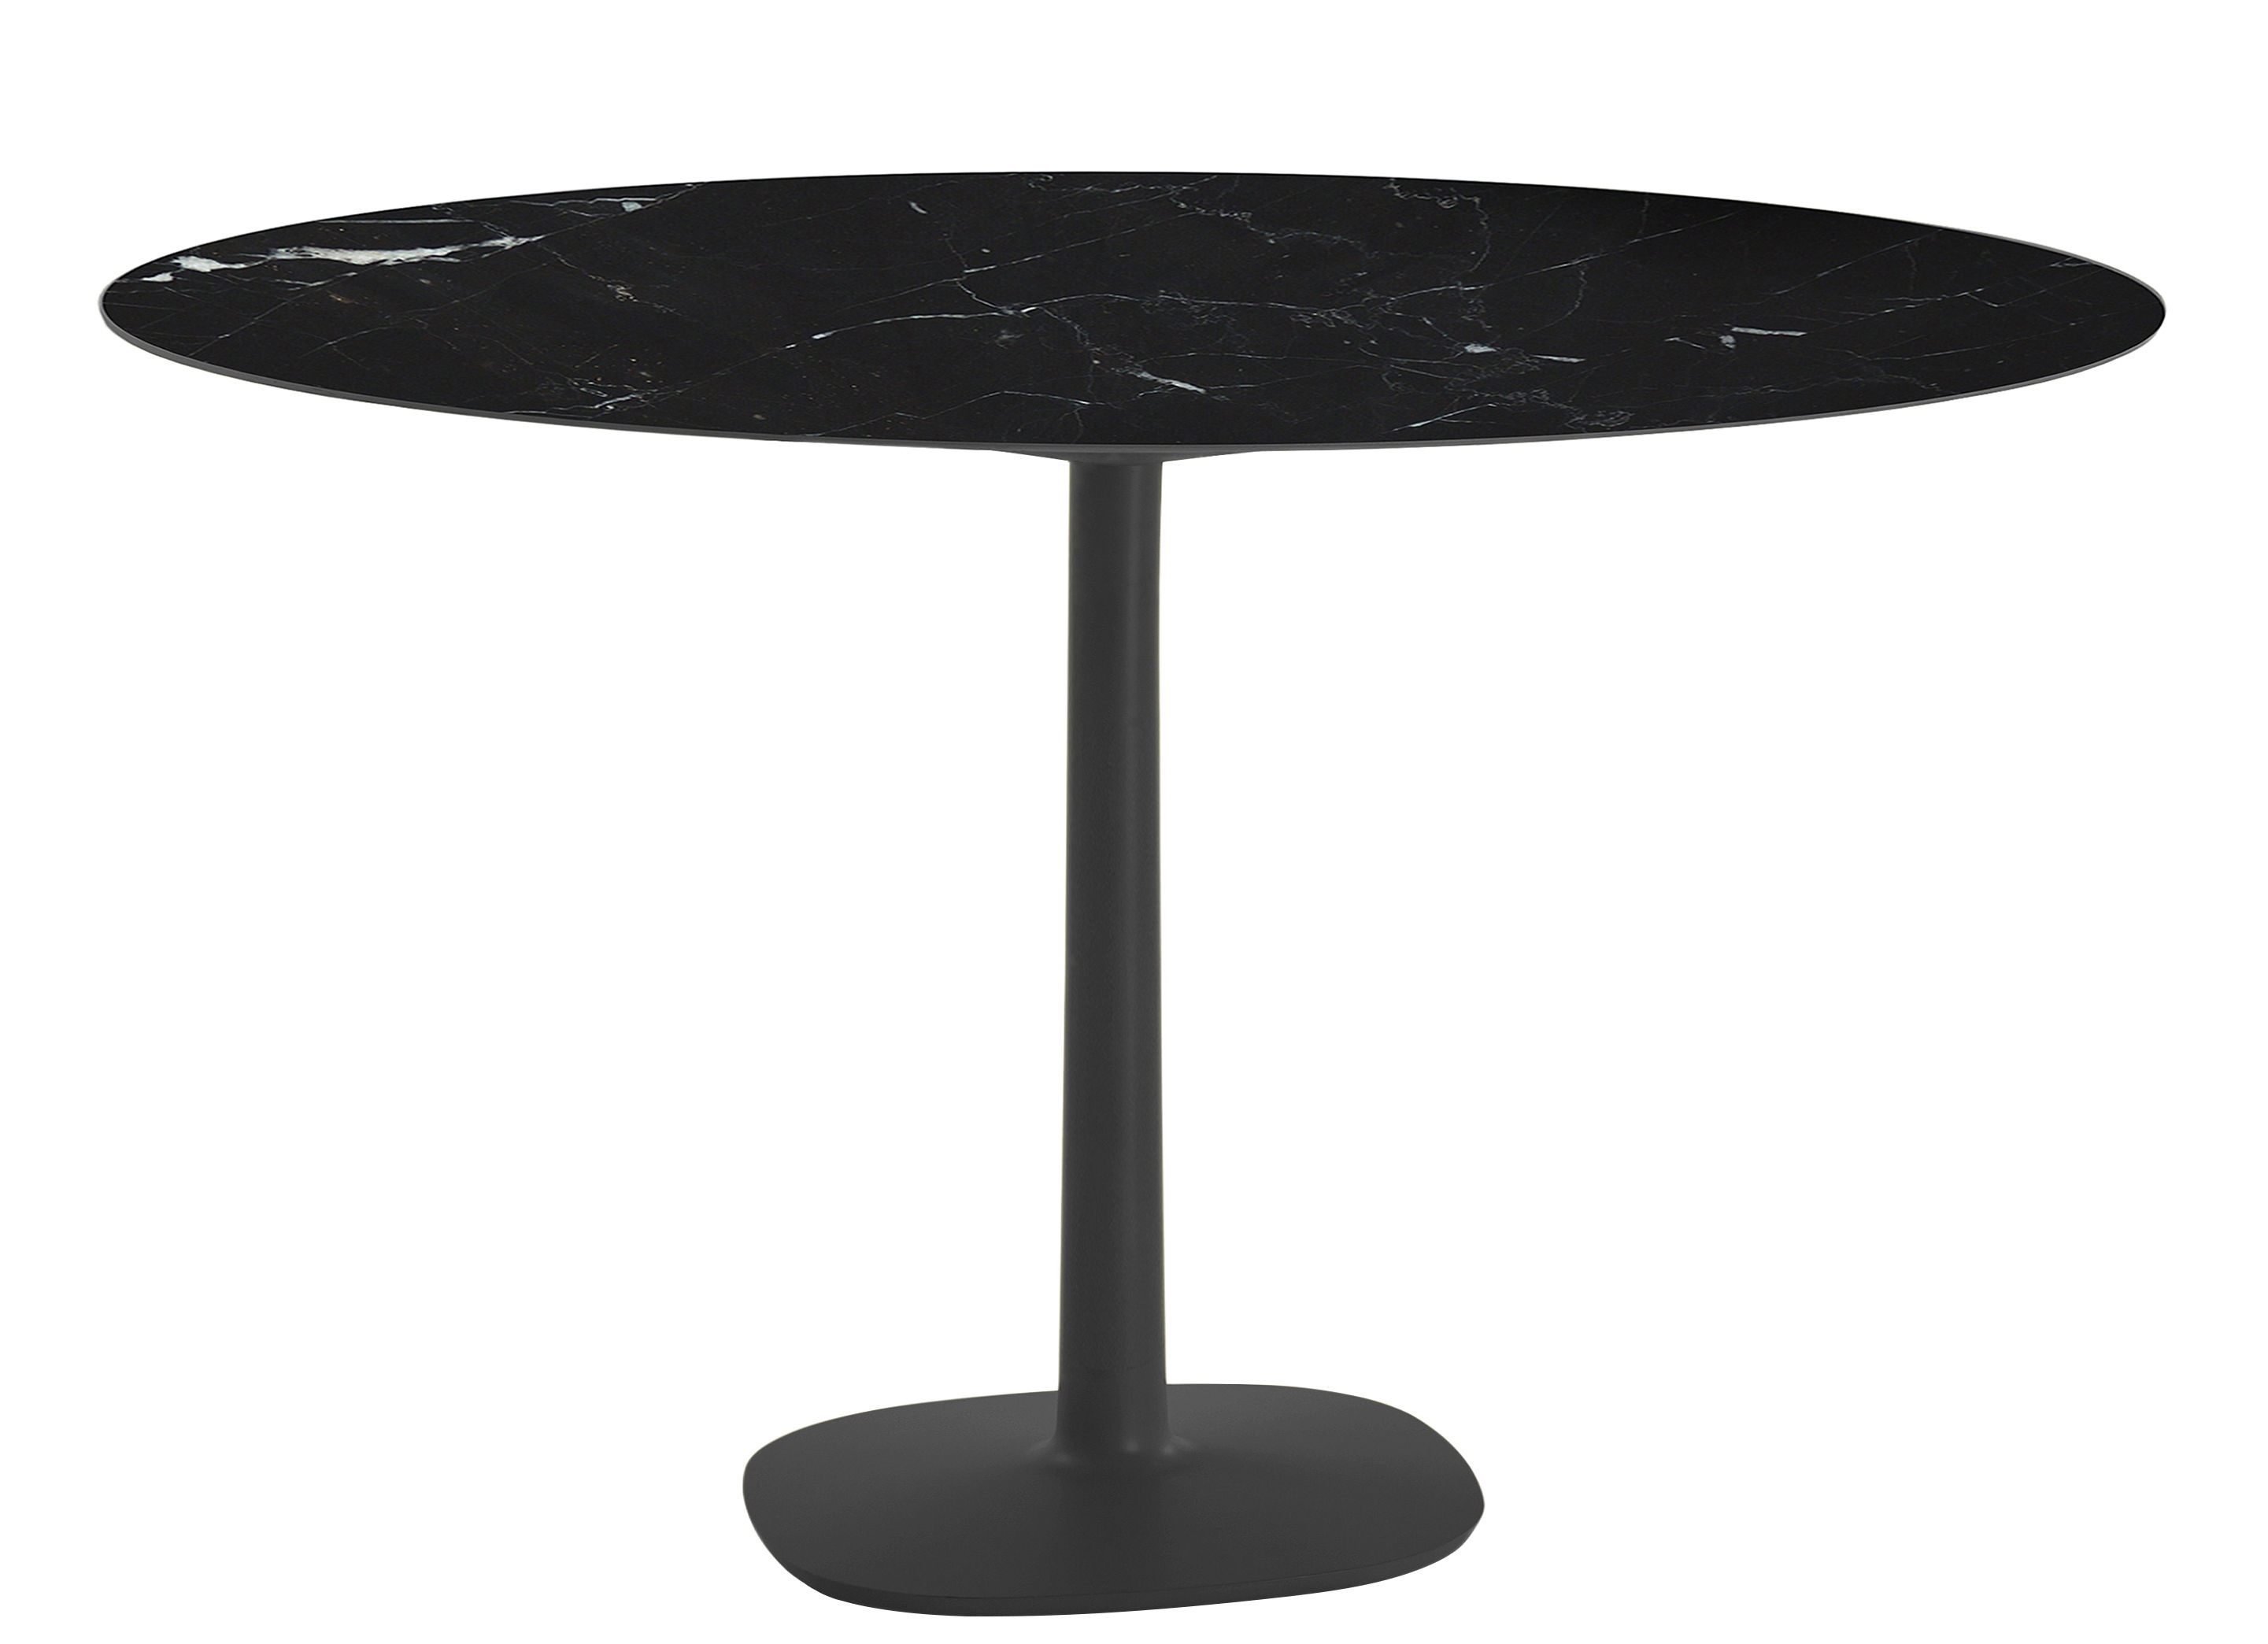 Jardin - Tables de jardin - Table Multiplo indoor/outdoor - Effet marbre/ Ø 118 cm - Kartell - Noir - Aluminium verni, Grès cérame effet marbre